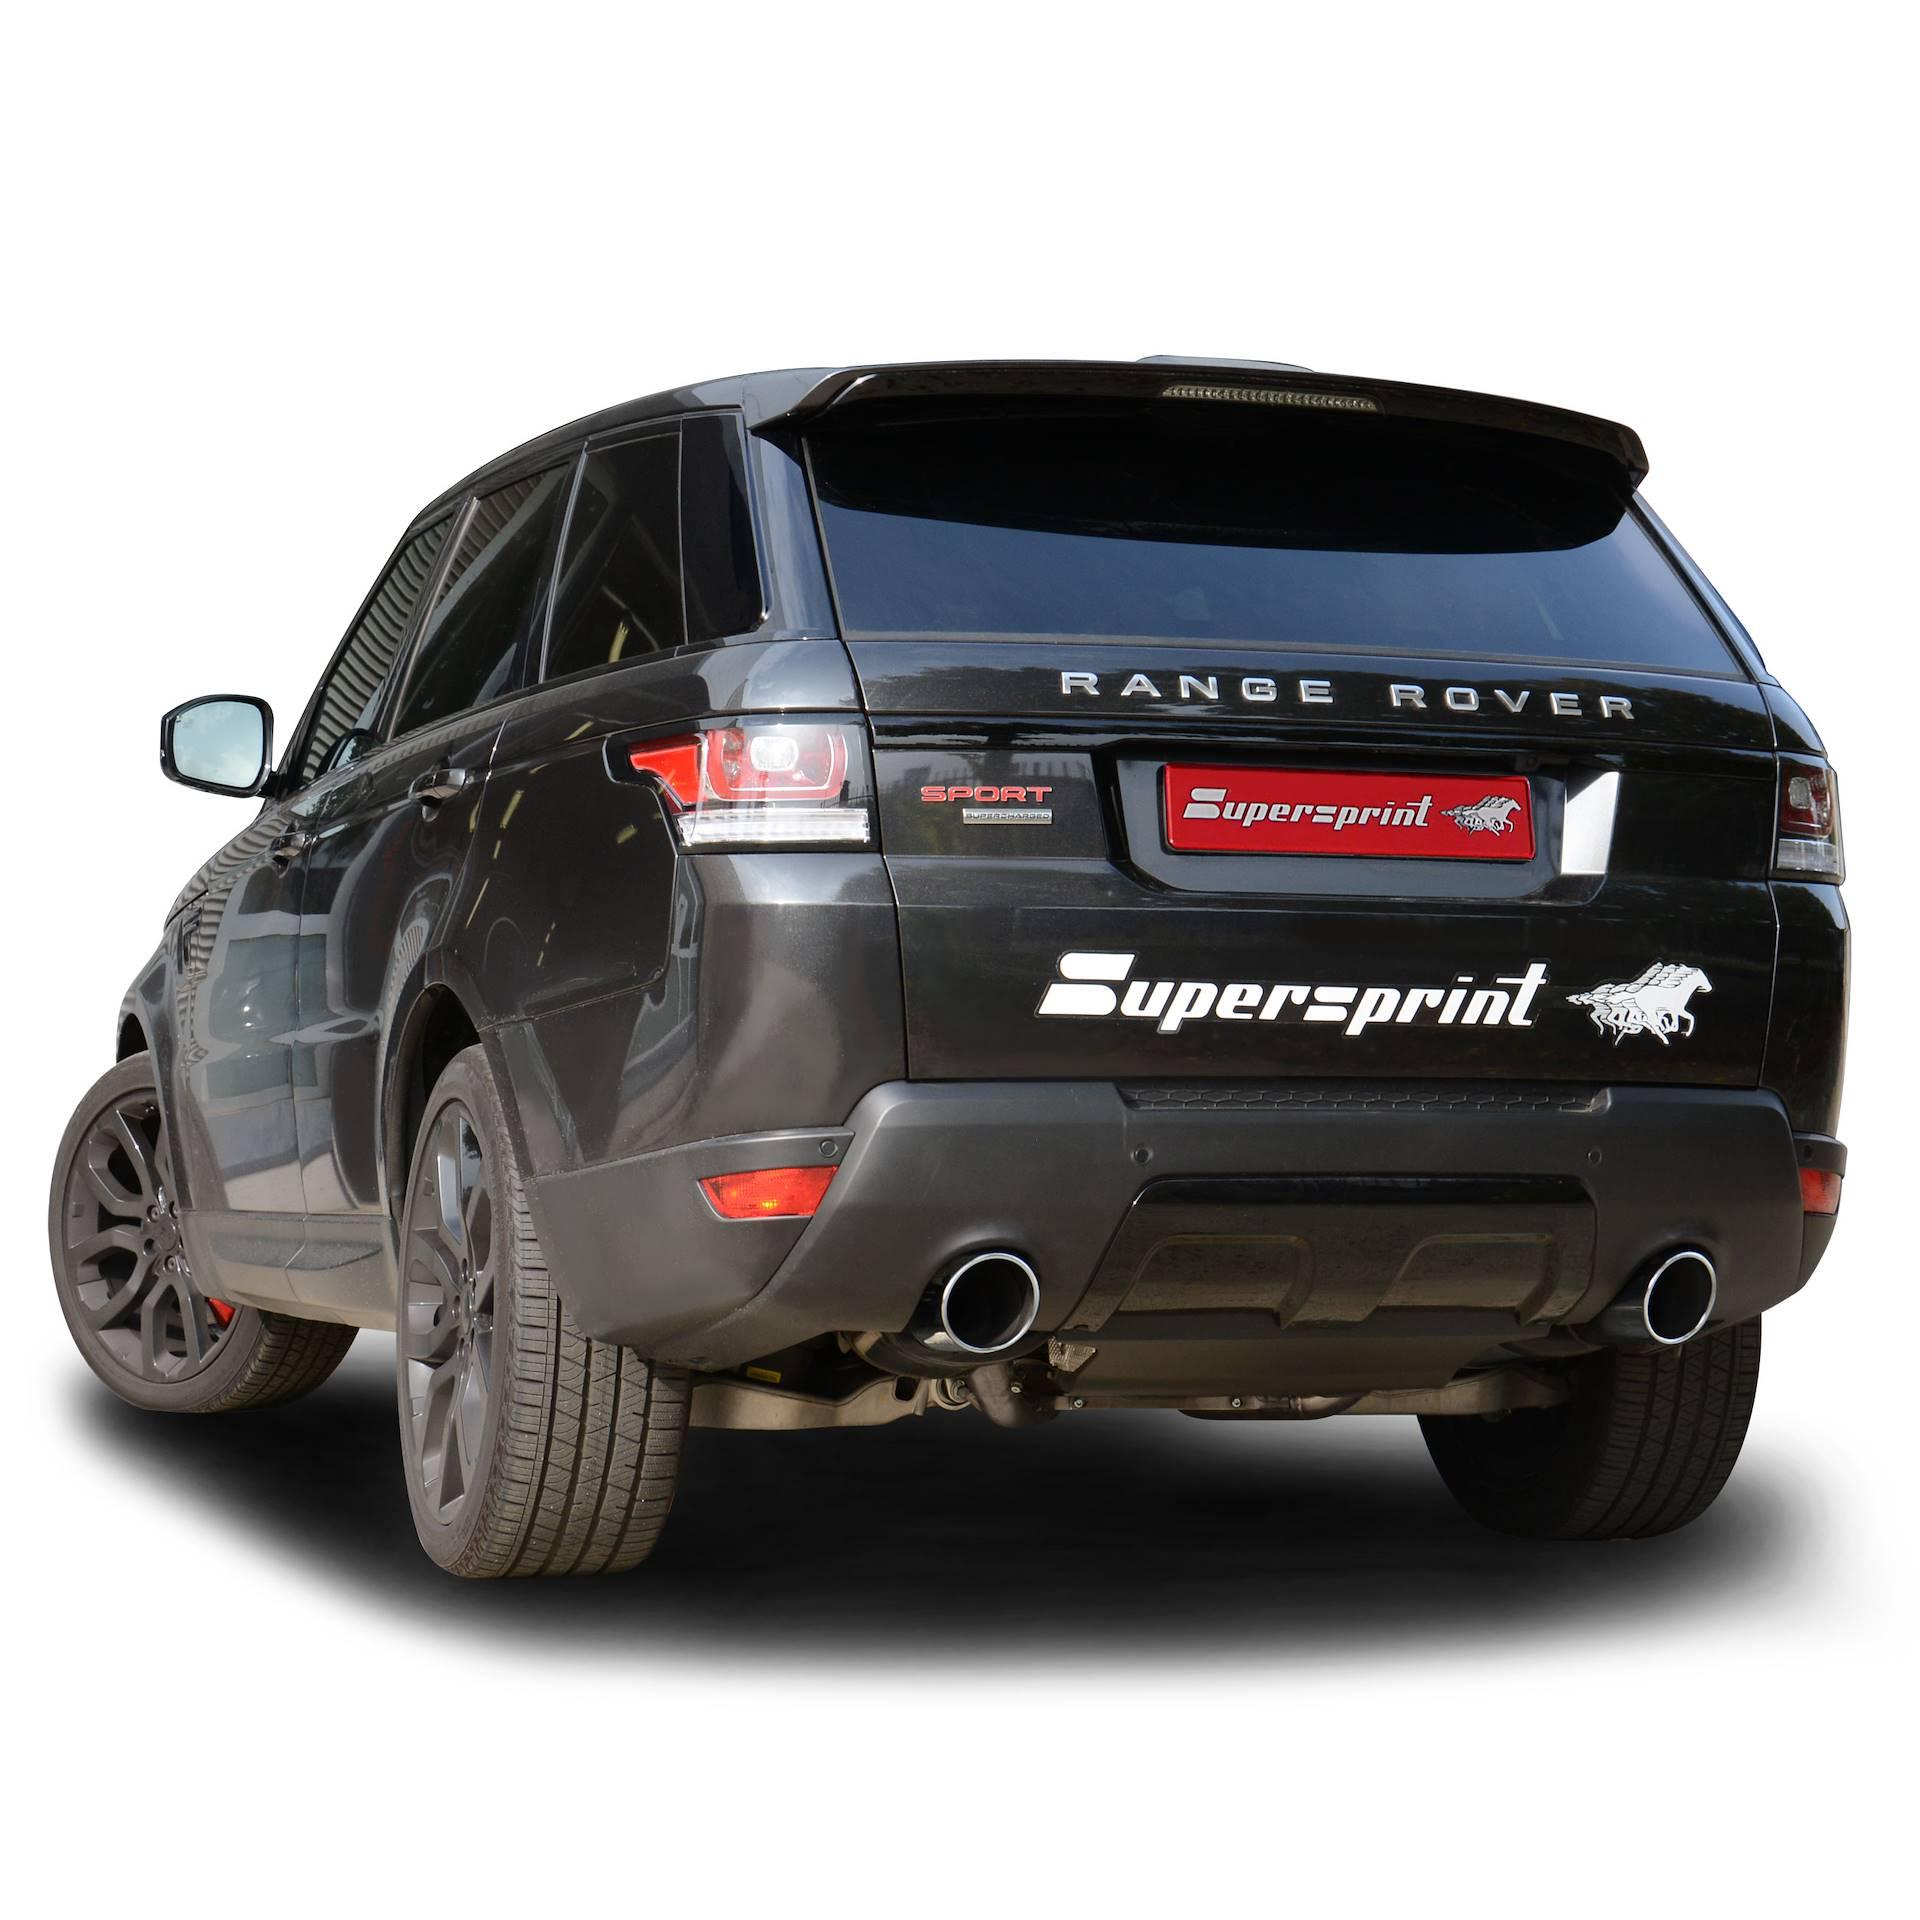 https://www.supersprint.com/public/img/Range-Rover-Sport-5-50173.jpg